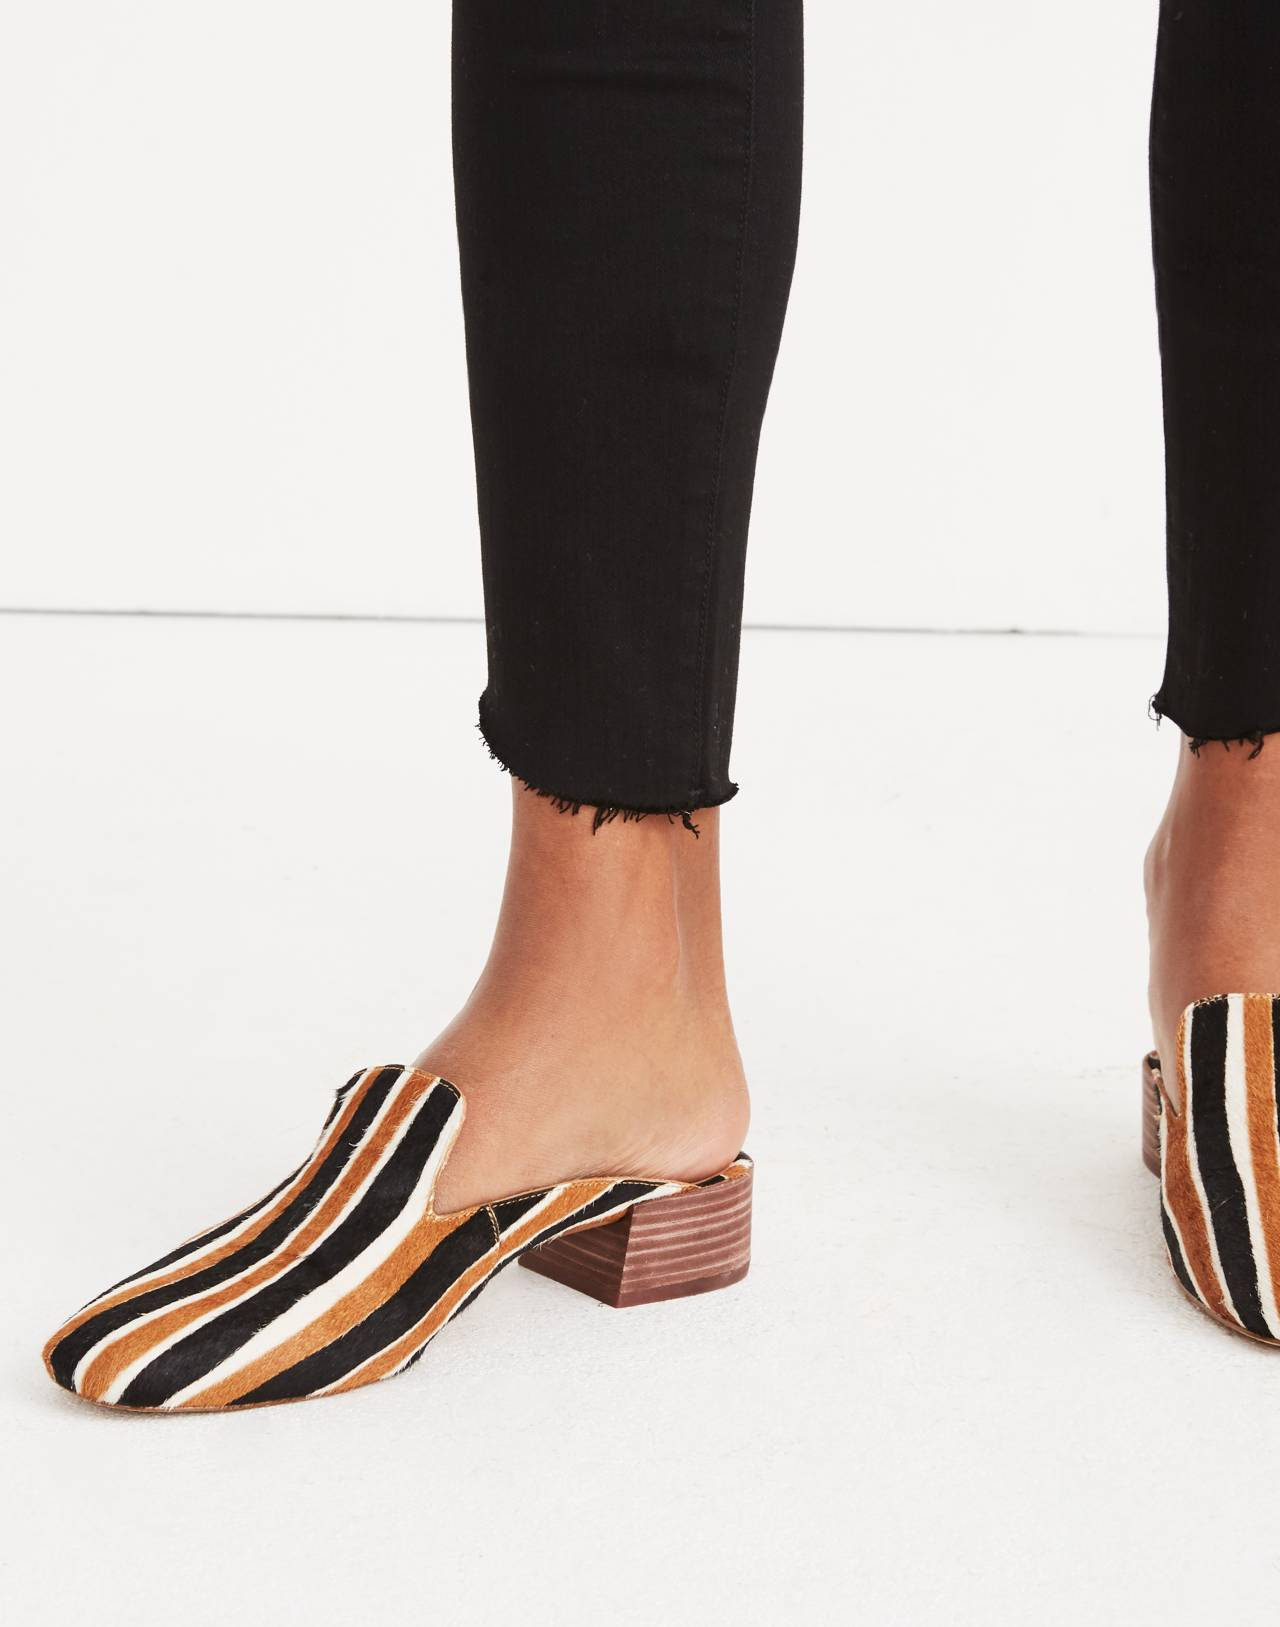 The Willa Loafer Mule in Striped Calf Hair in acorn multi image 2